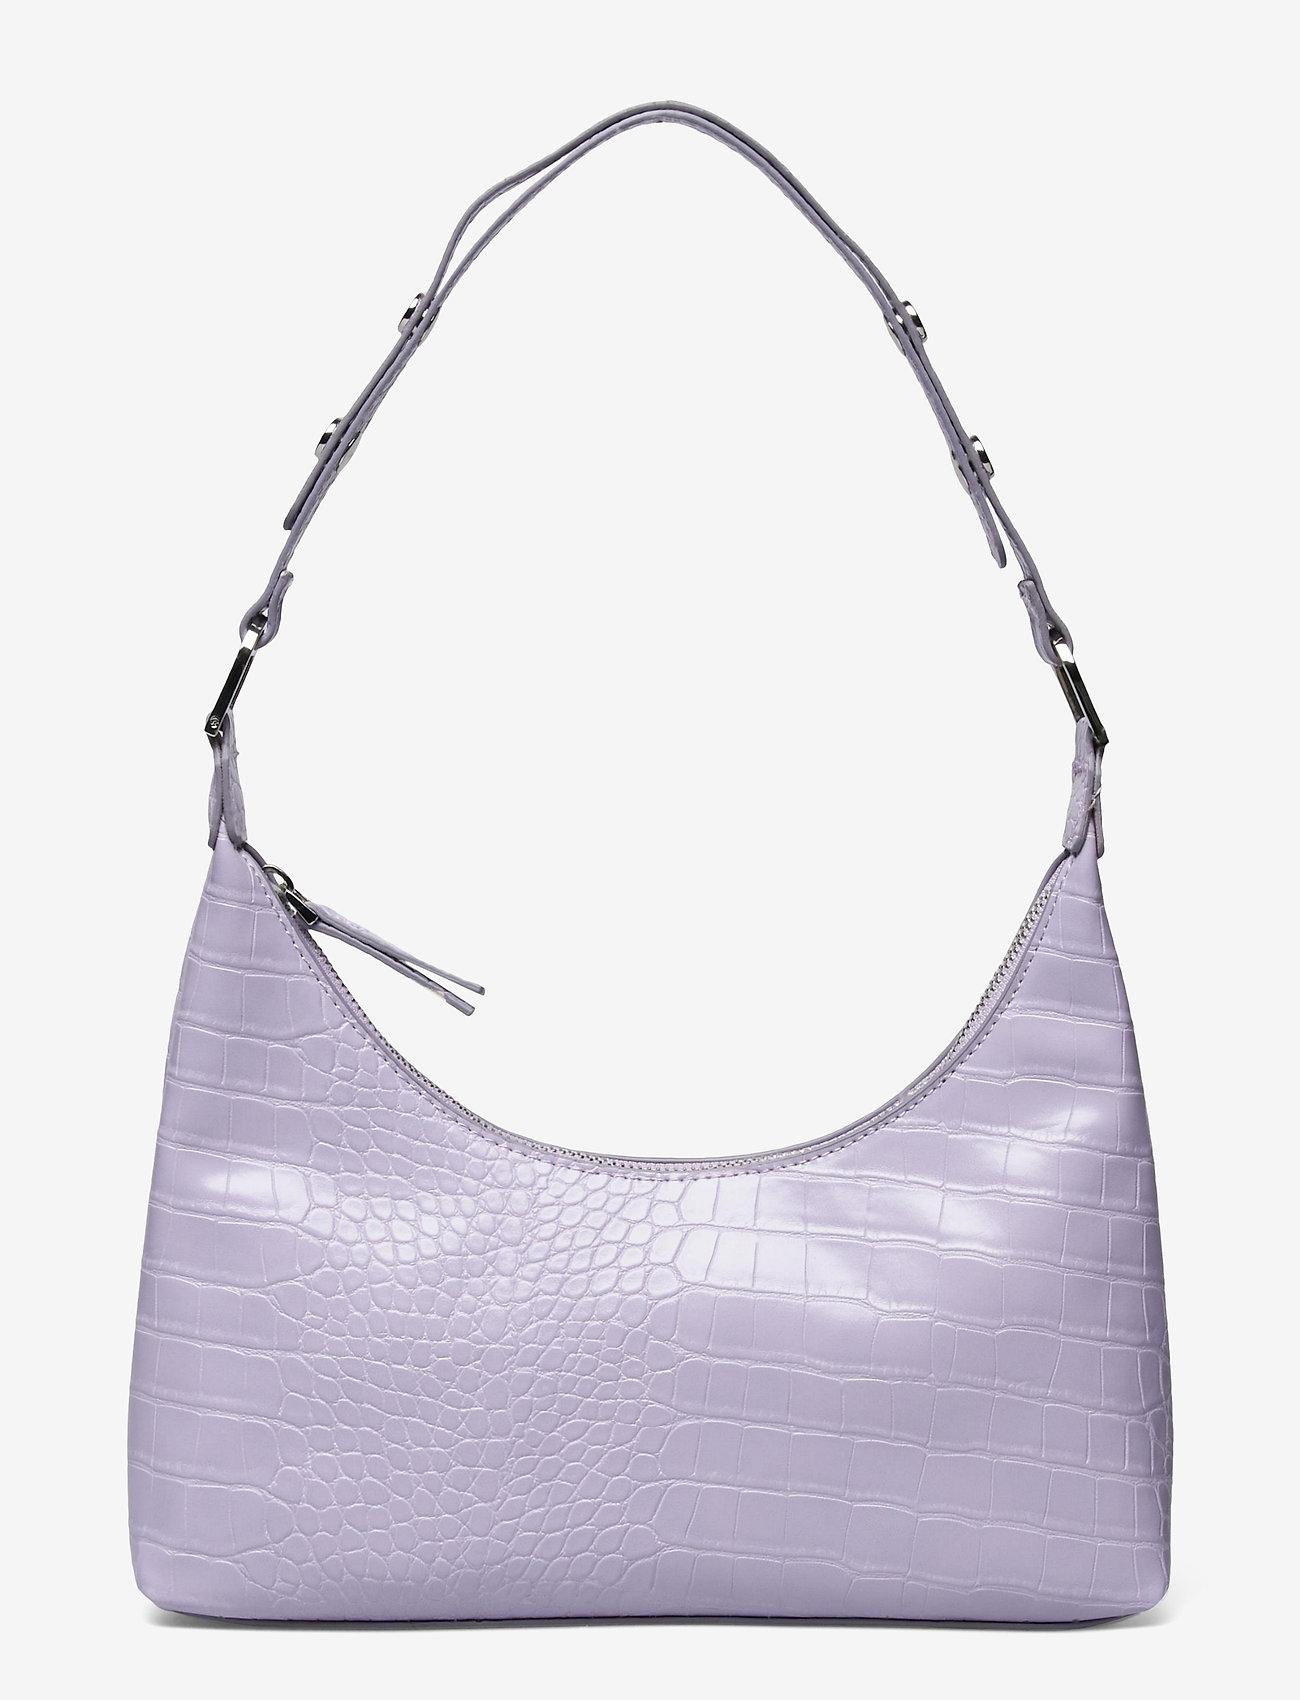 Mango - KARINA - axelremsväskor - light/pastel purple - 0